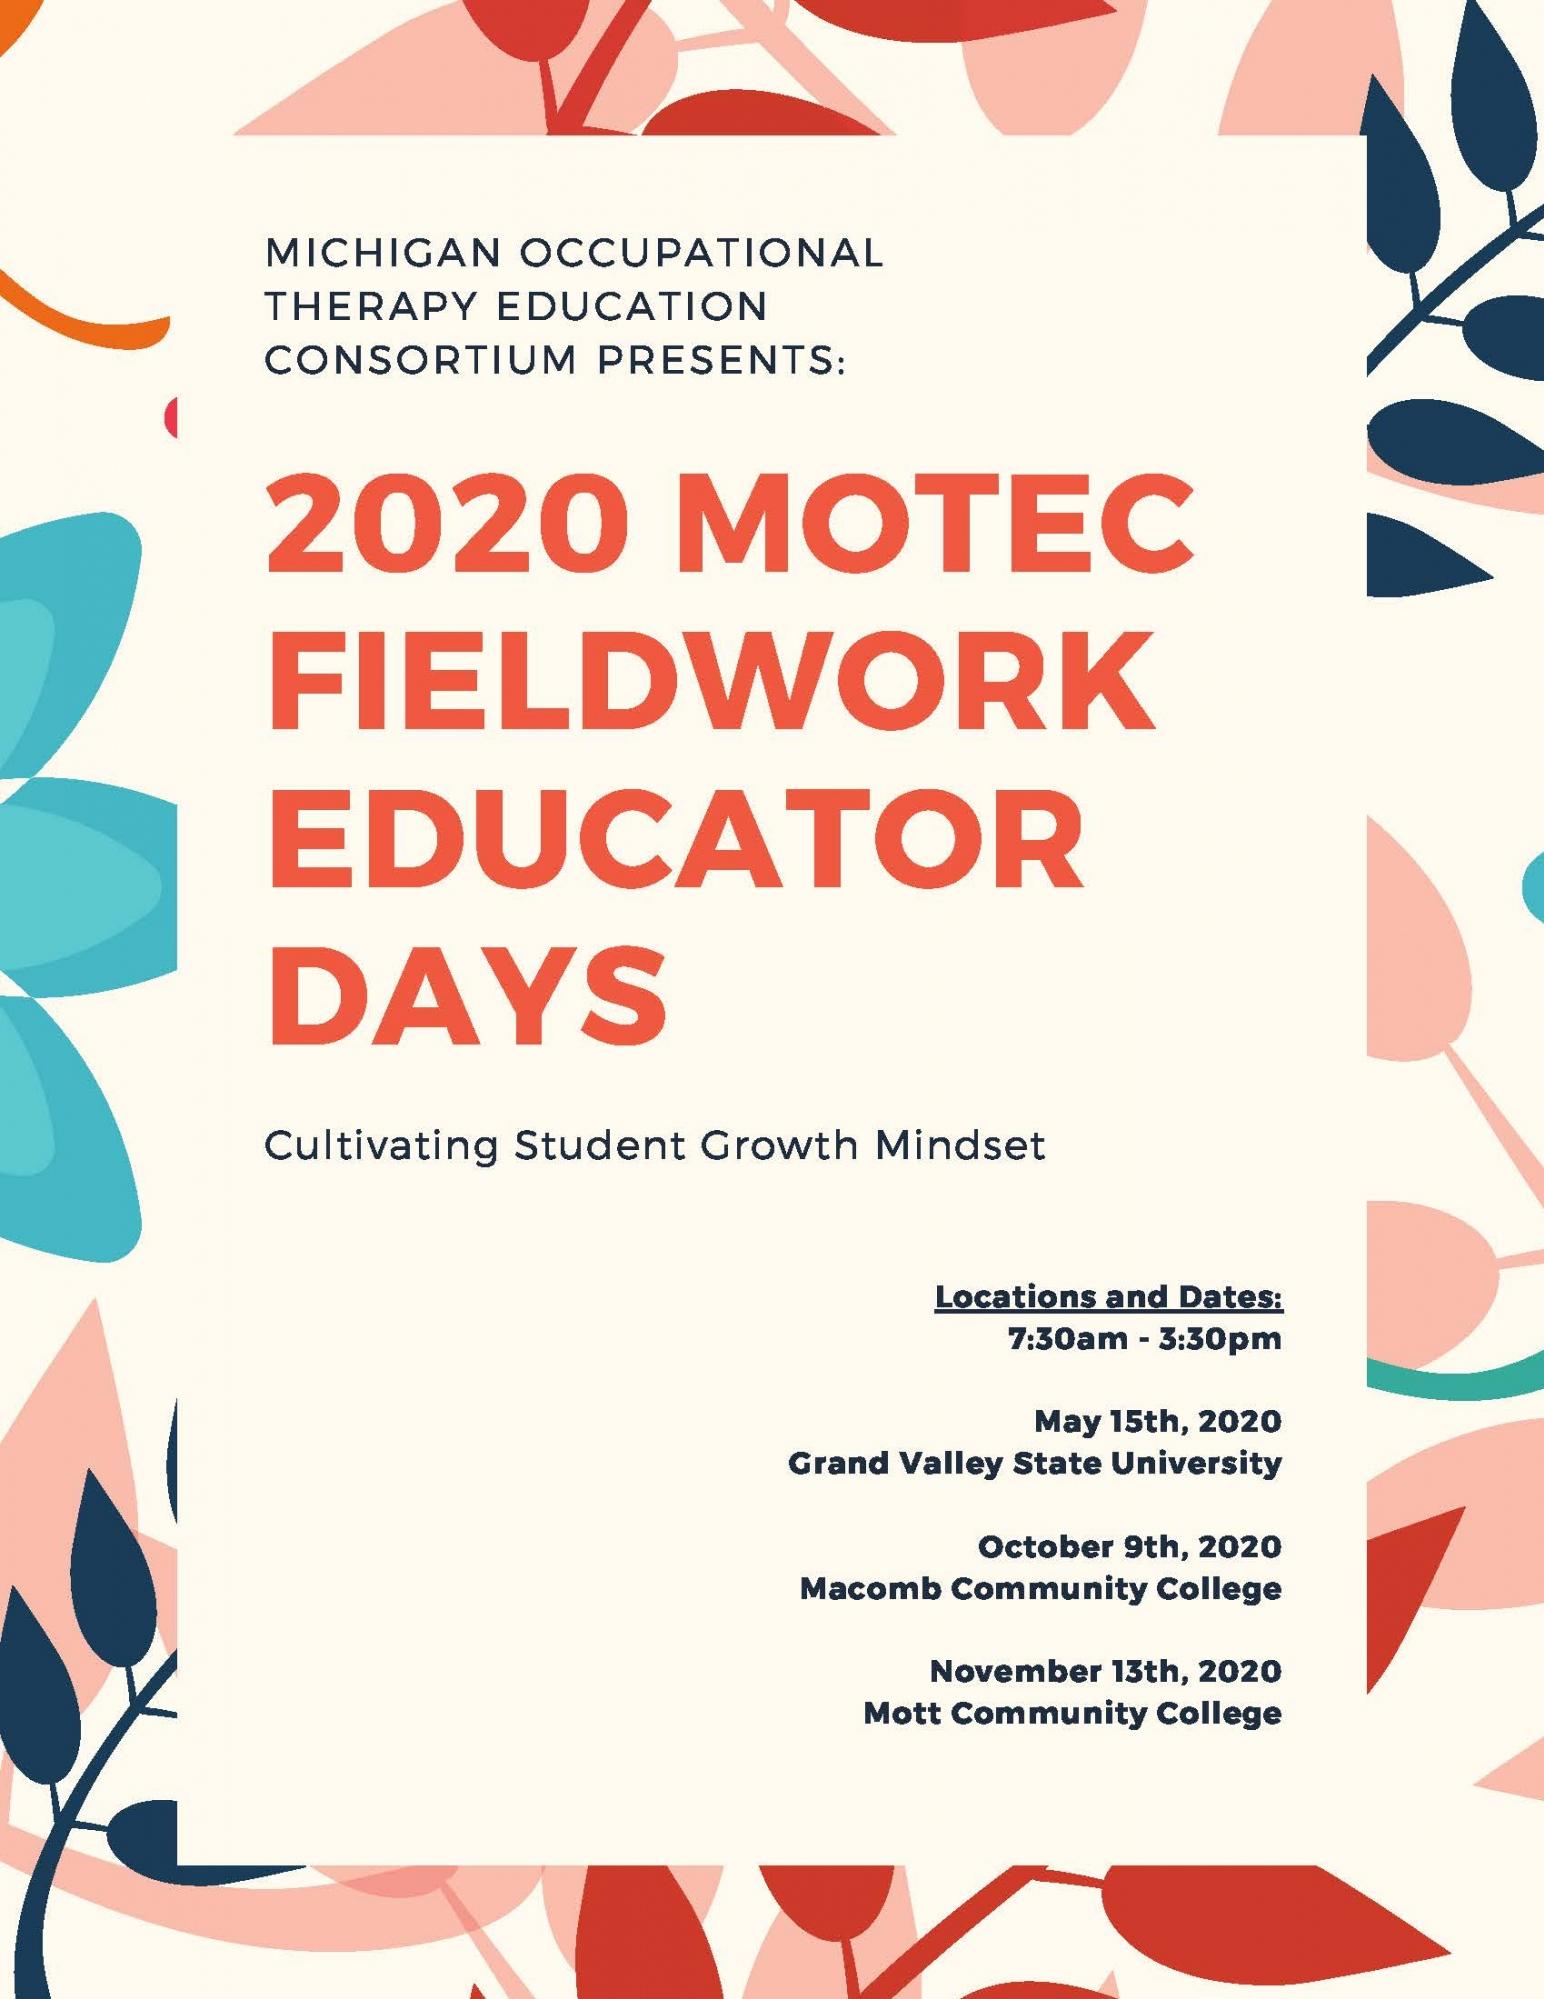 MOTEC 2020 Fieldwork Educator Days Image